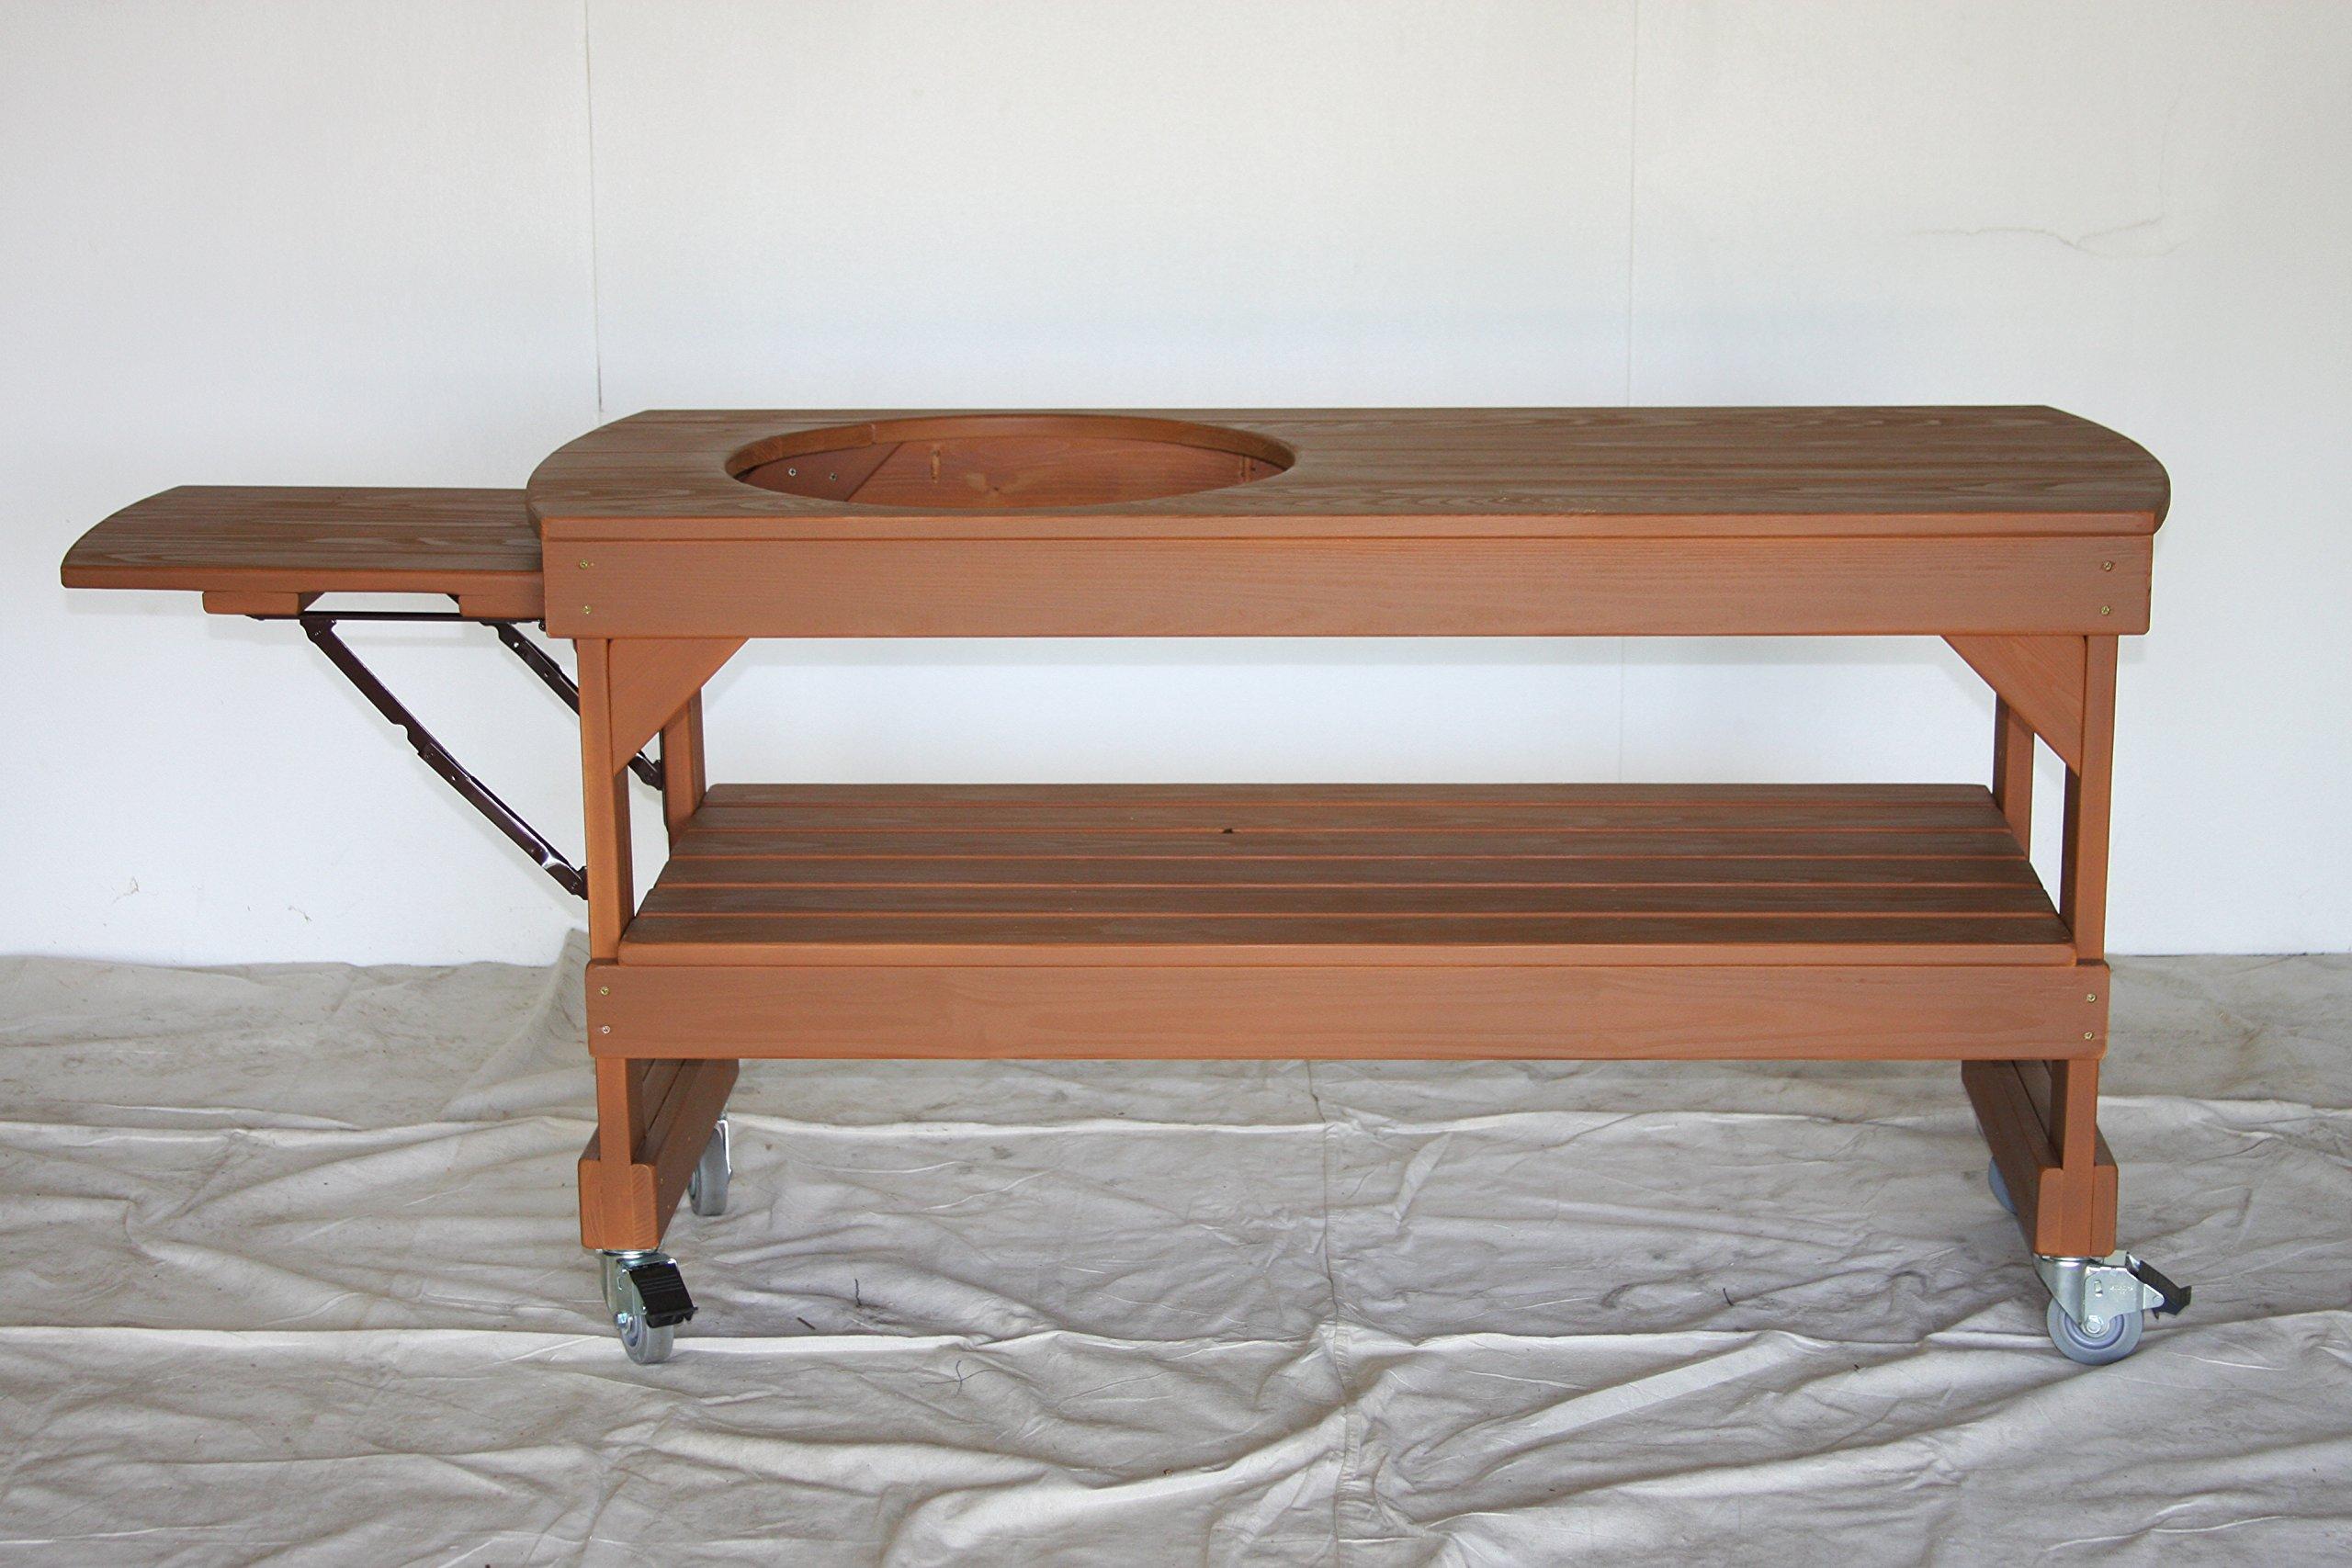 J S Designs Shop, LLC Big Green Egg Long Cypress Table for Large BGE Grill with Free Drop Leaf Shelf by J S Designs Shop, LLC